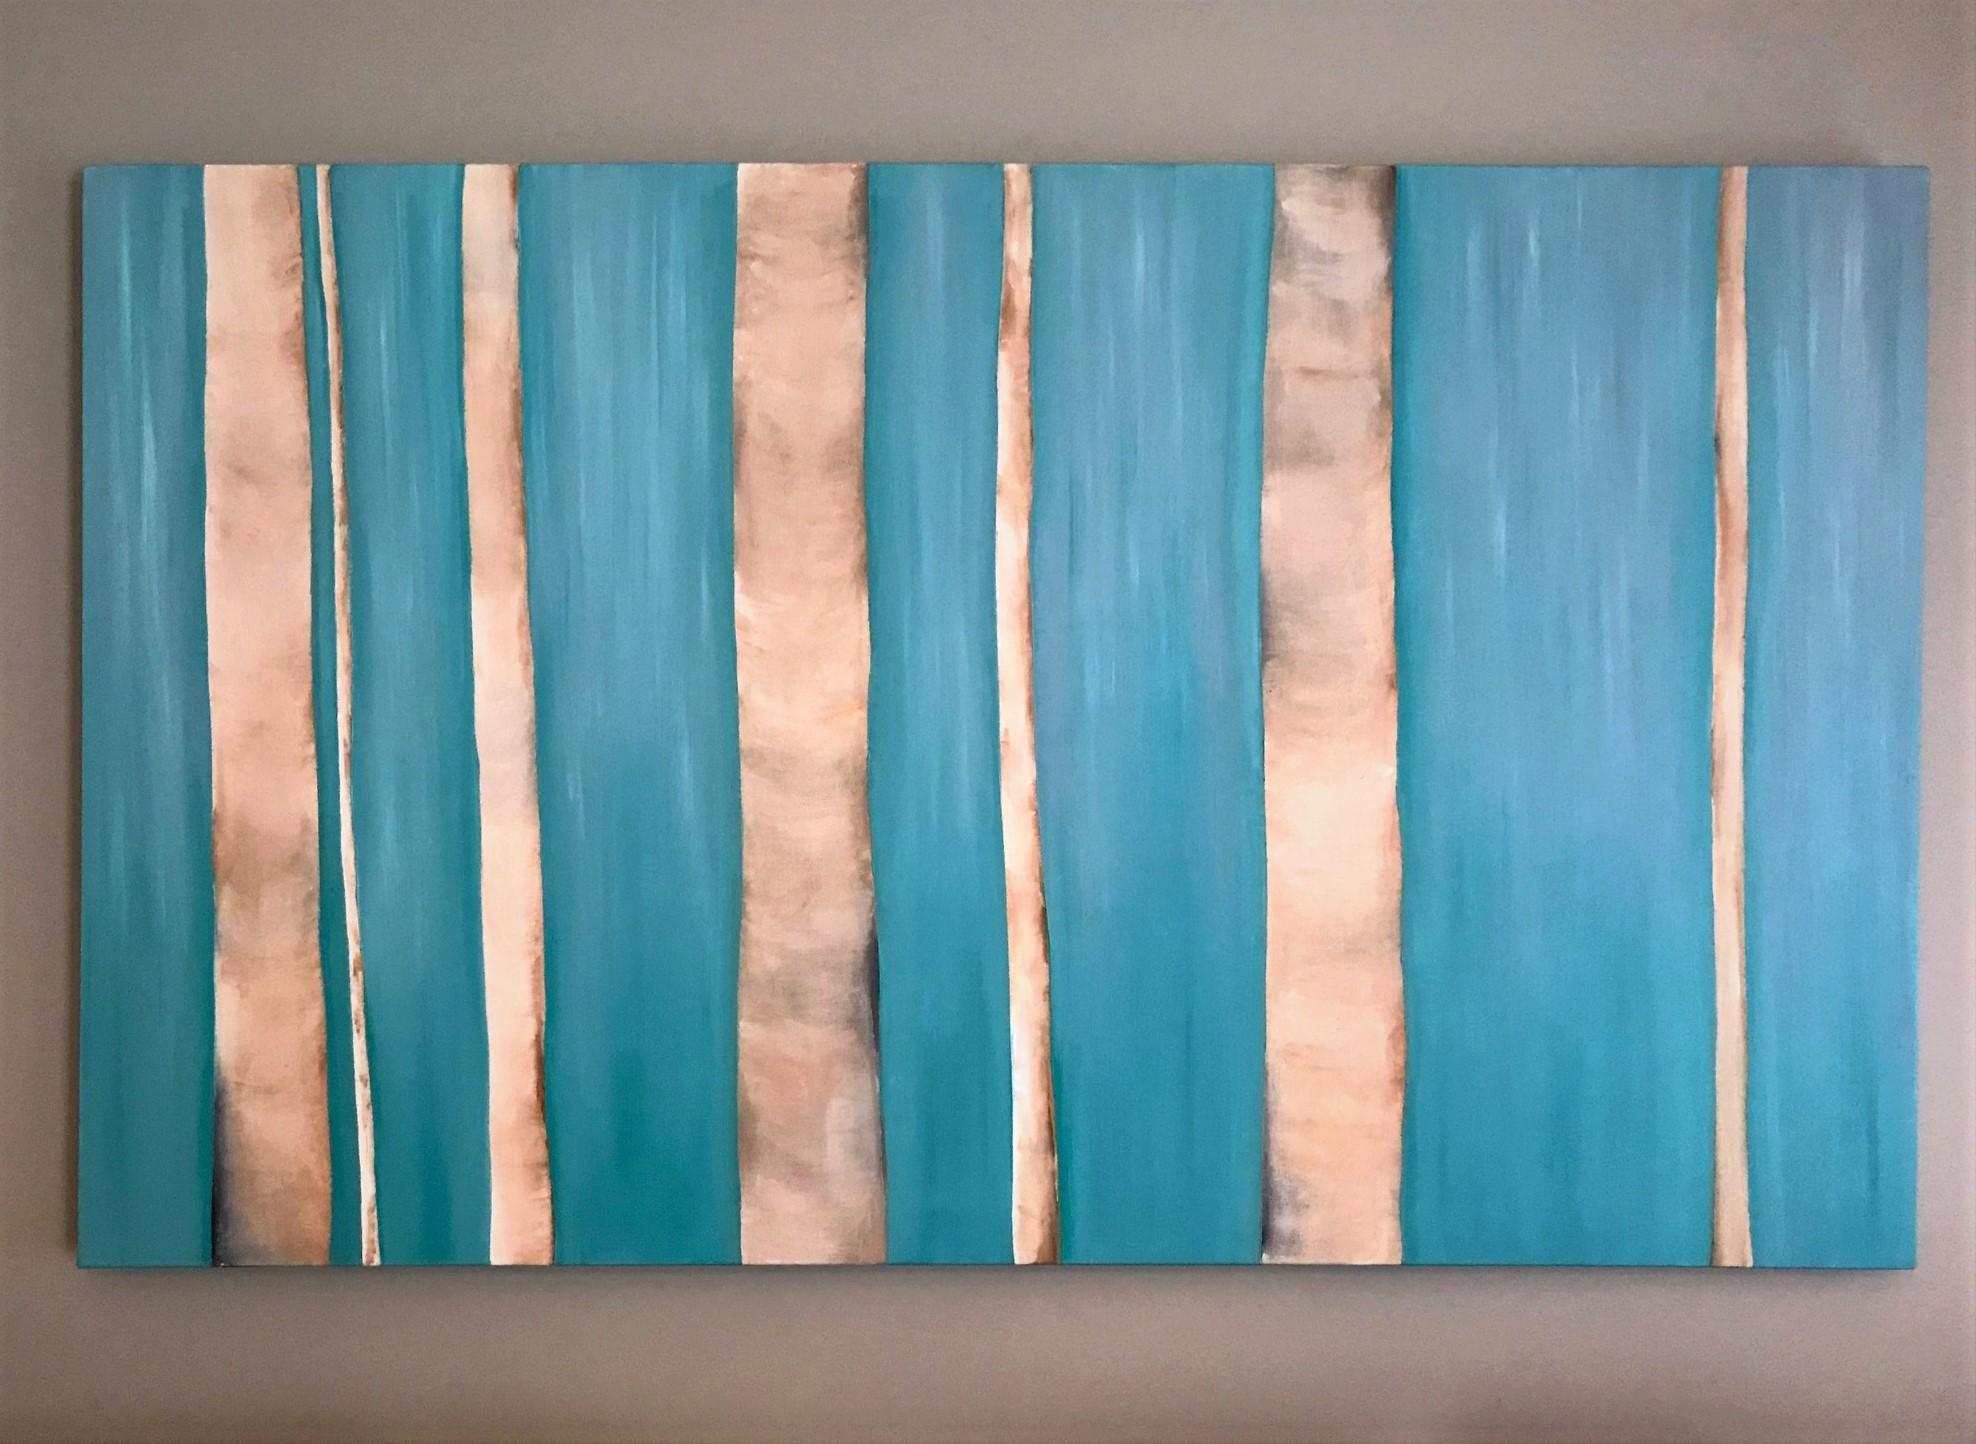 "Birch Forest   2009   36"" x 60"" (91.4 x 152.4 cm)  oil on canvas"